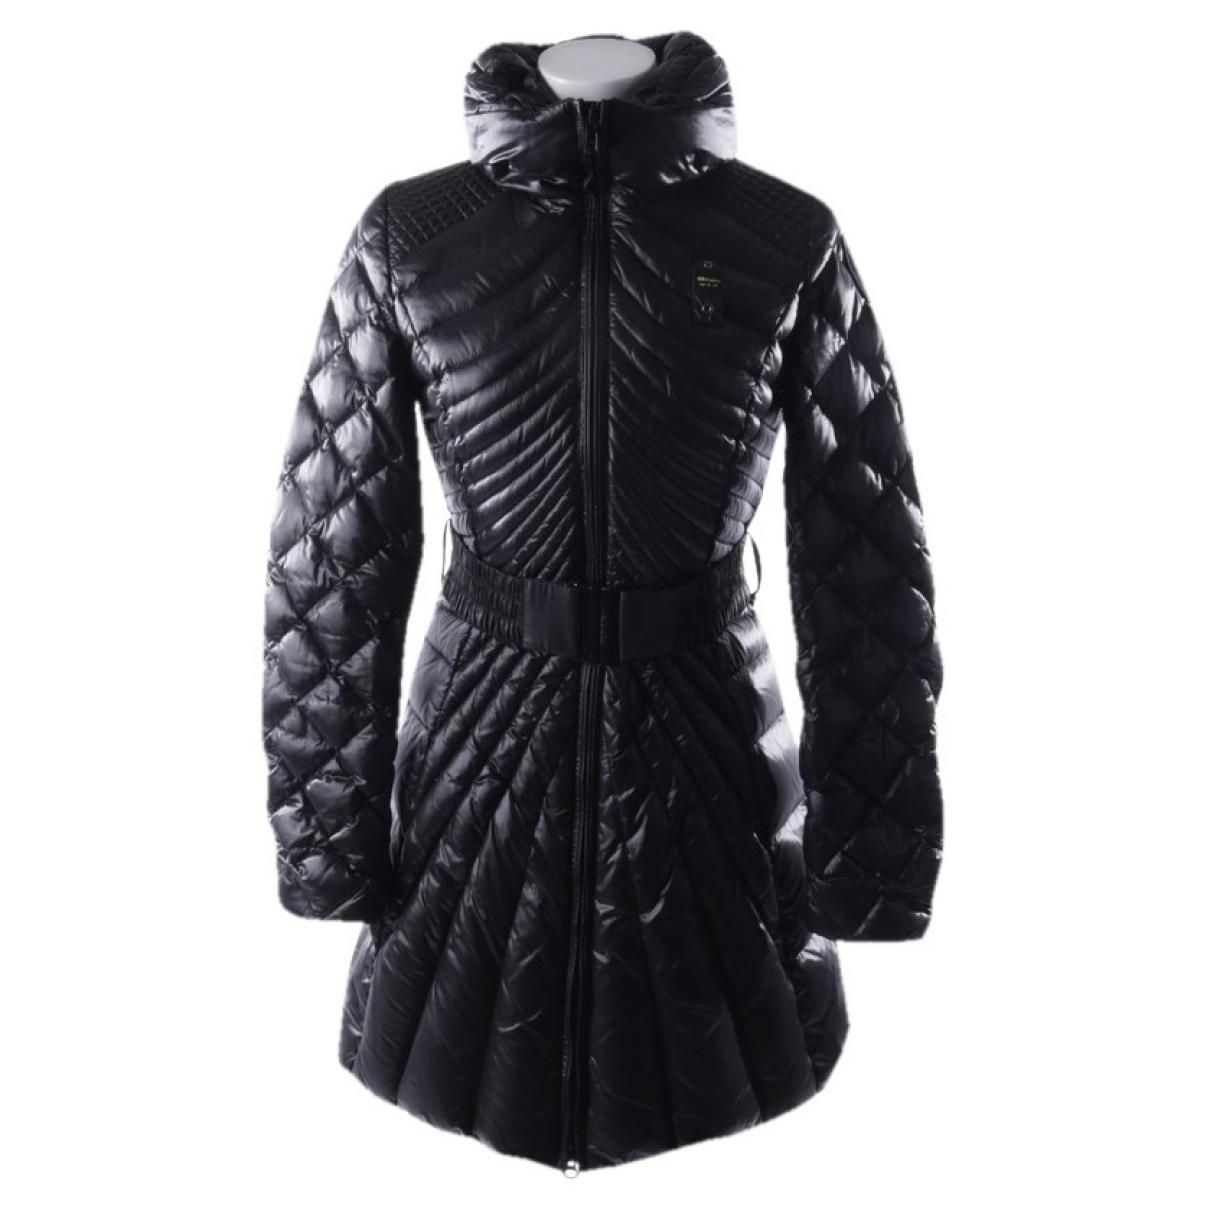 Blauer \N Black jacket for Women 38 FR